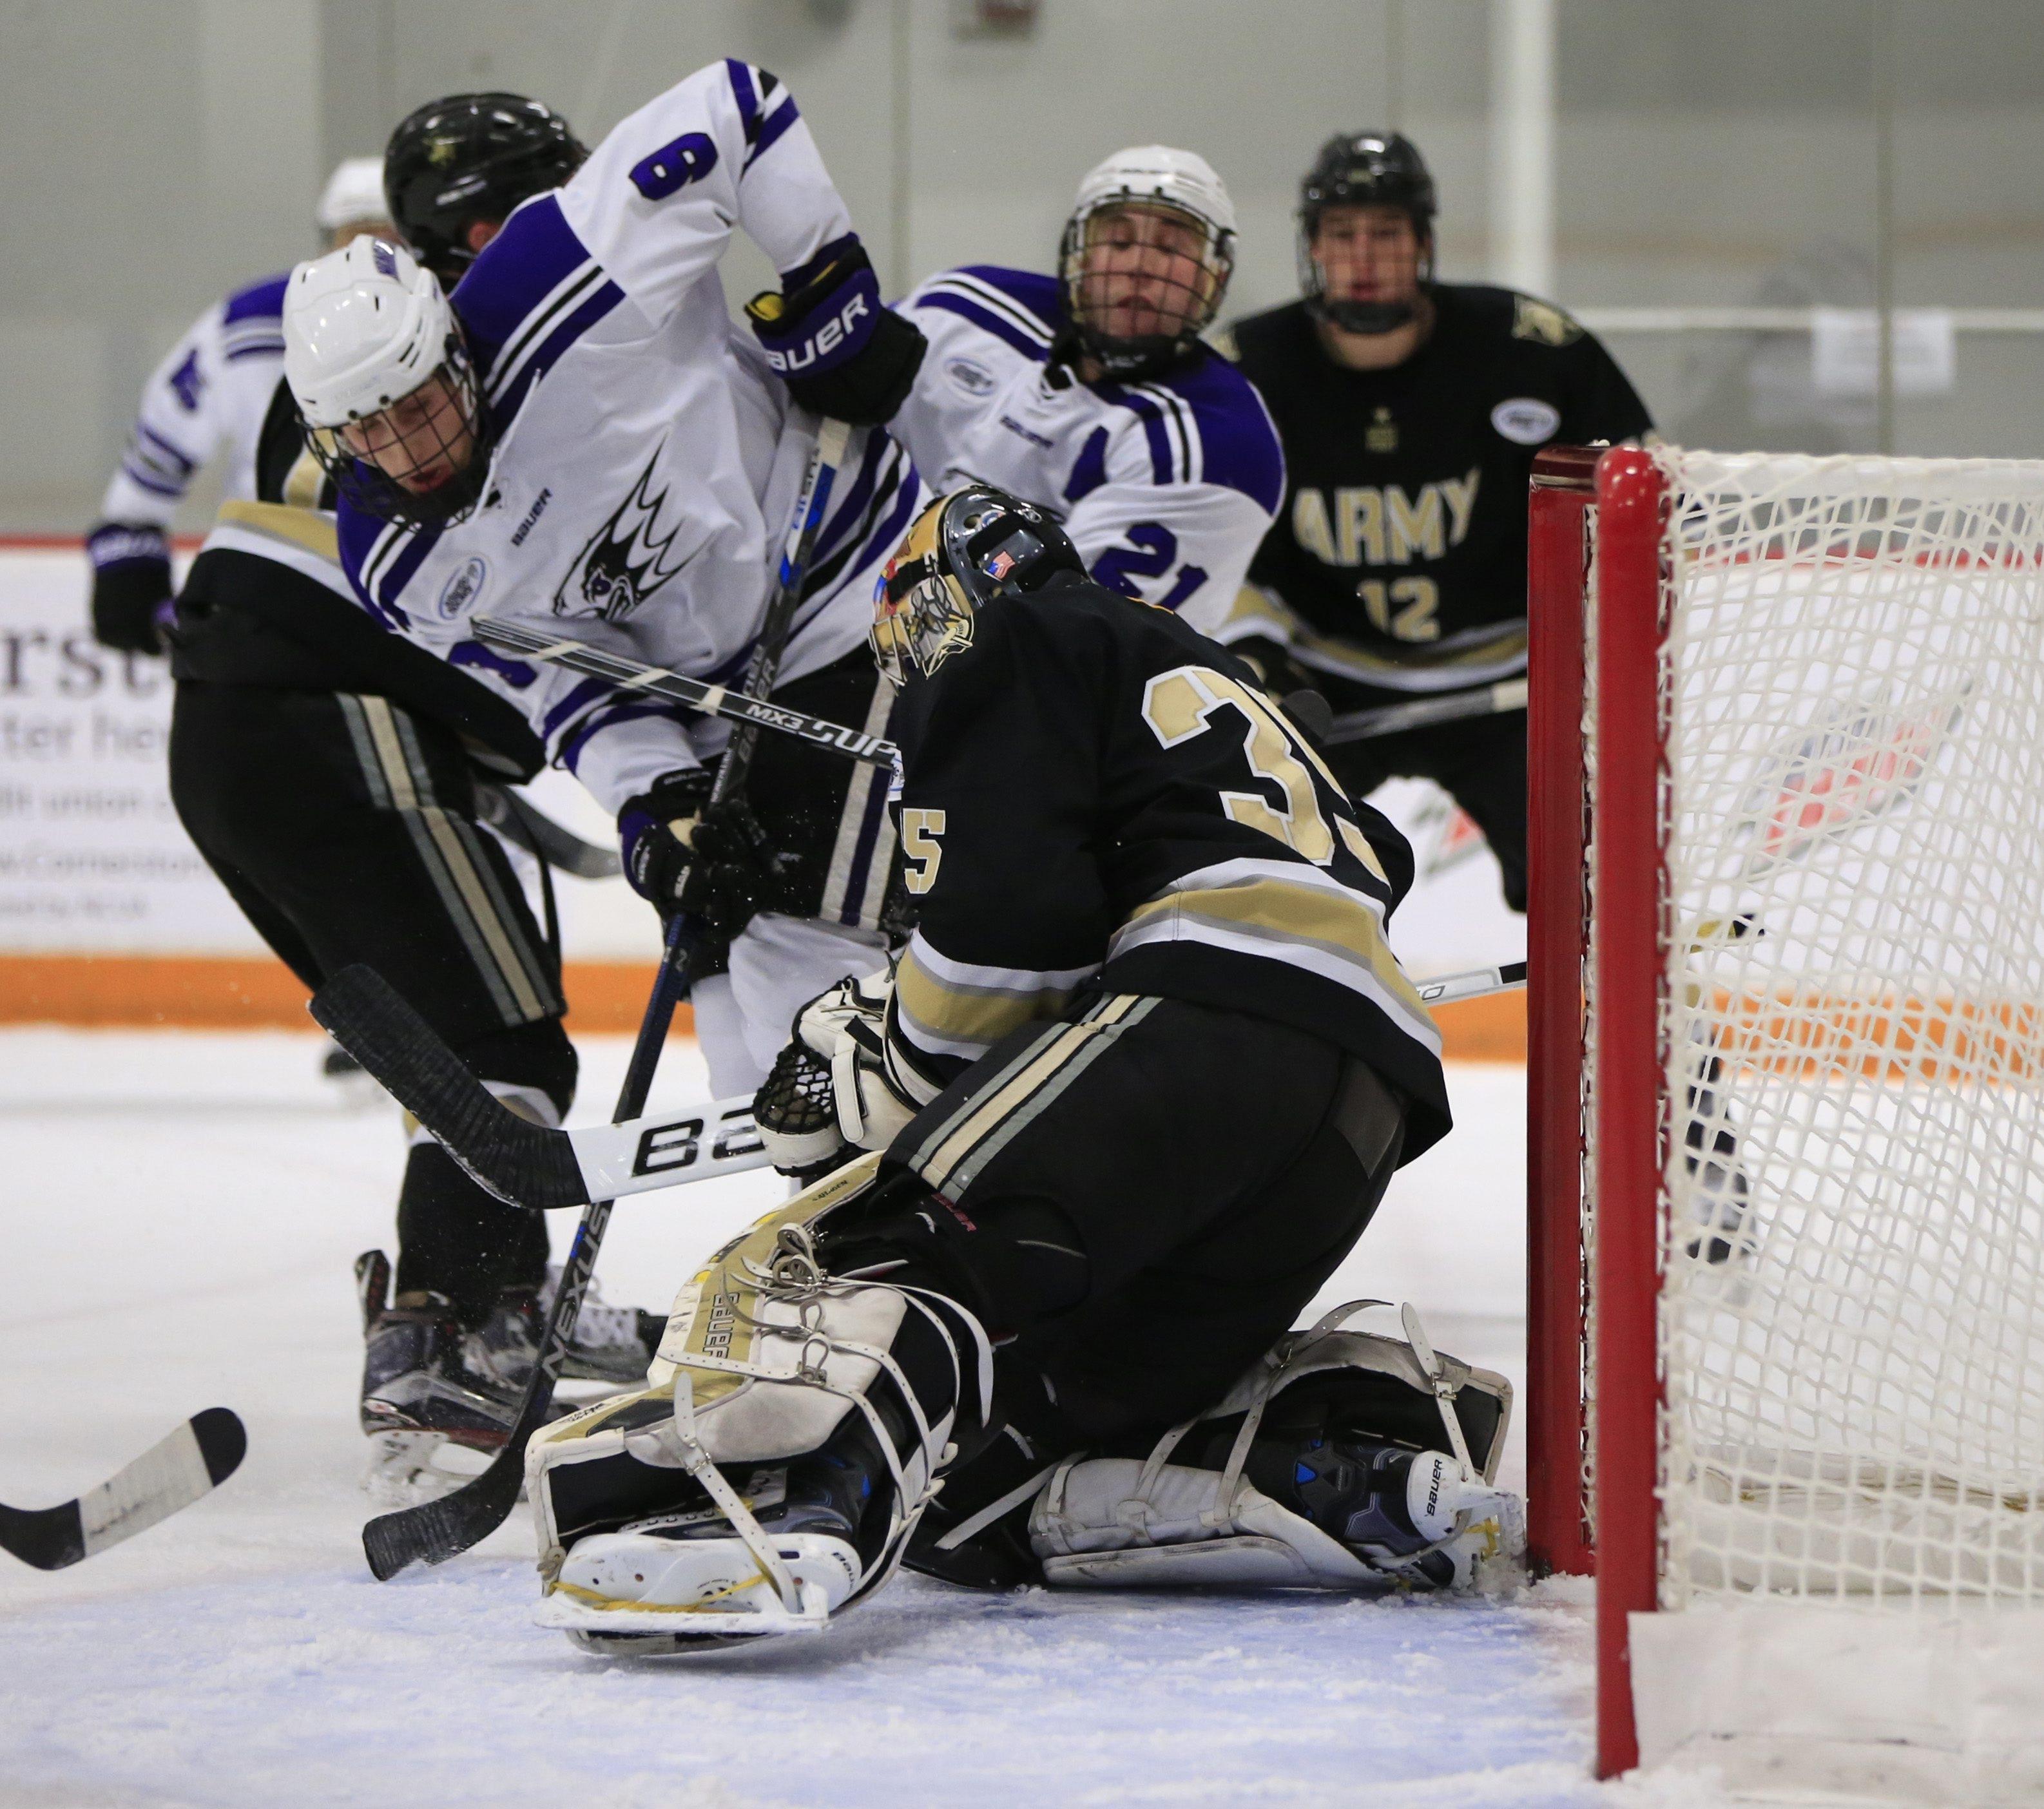 Army goaltender Parker Gahagen stops Niagara University's Stephen Pietrobon during the second period.